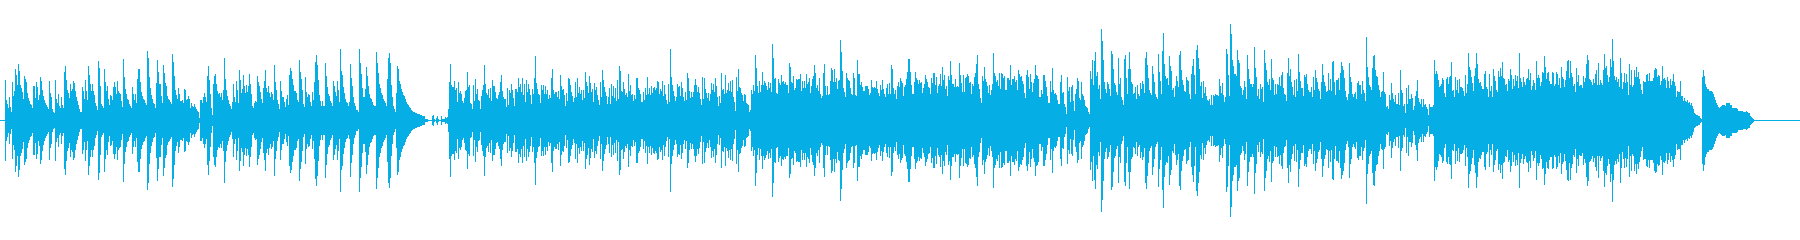 FineRain_(jazz 2)の再生済みの波形